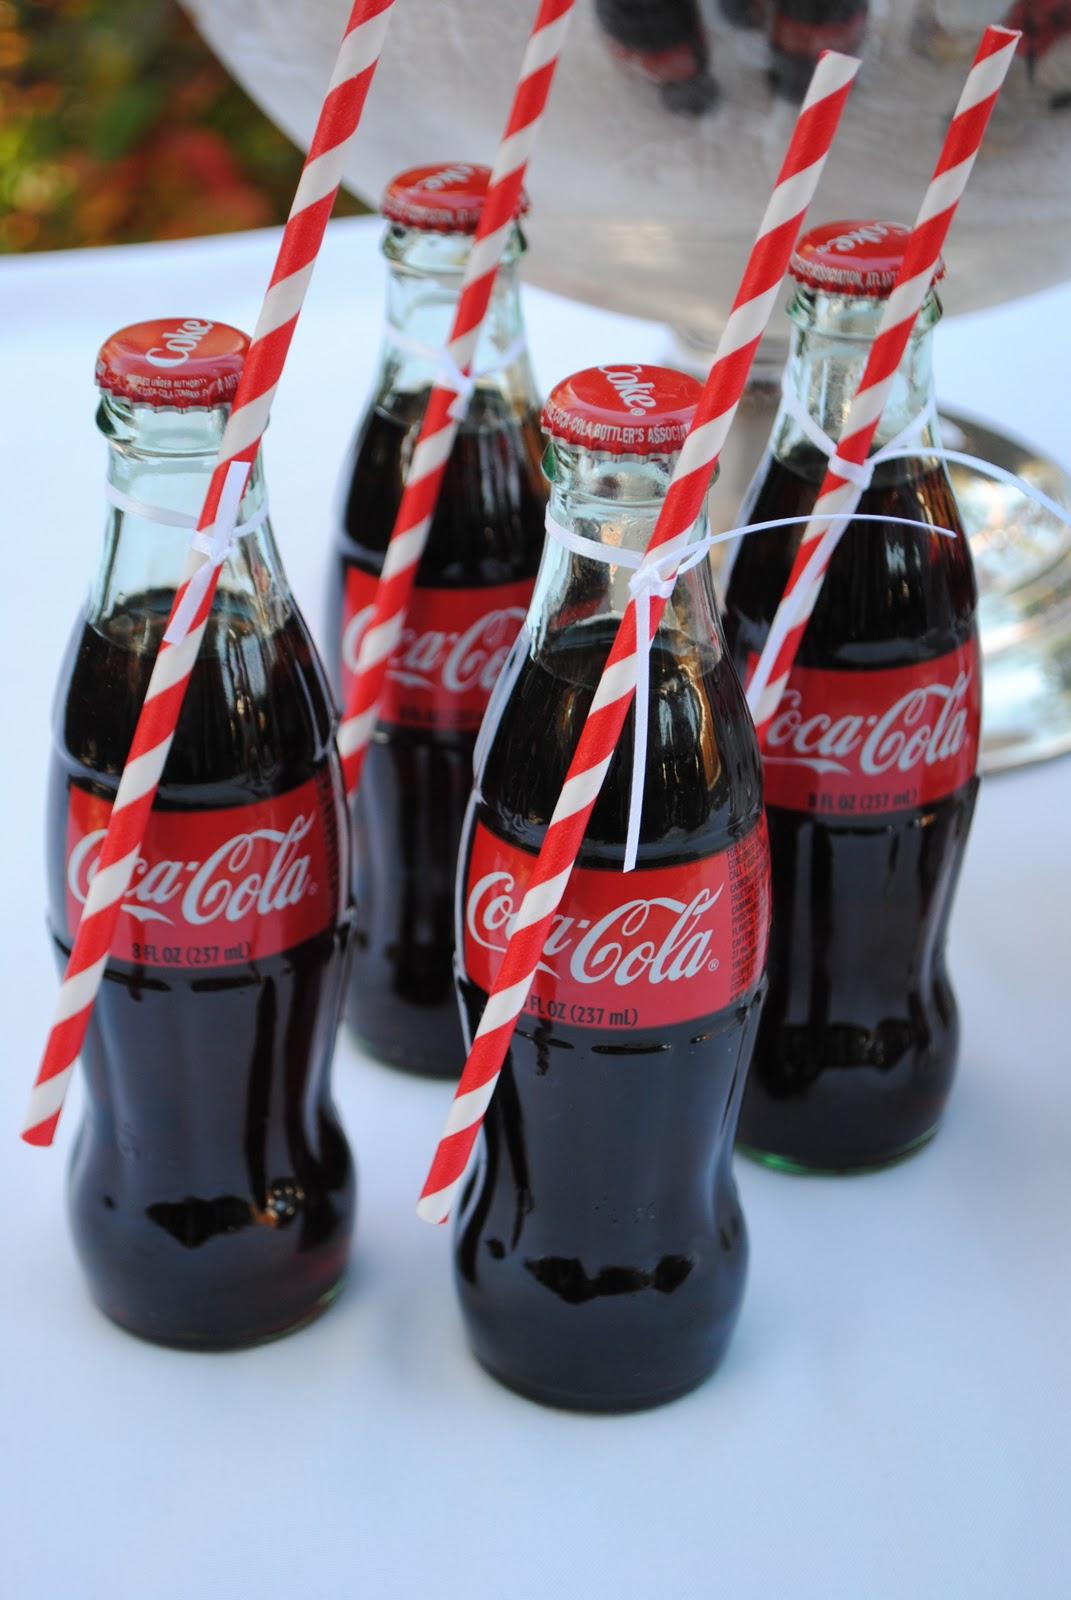 Jac o' lyn Murphy: Kids' Christmas Drinks...